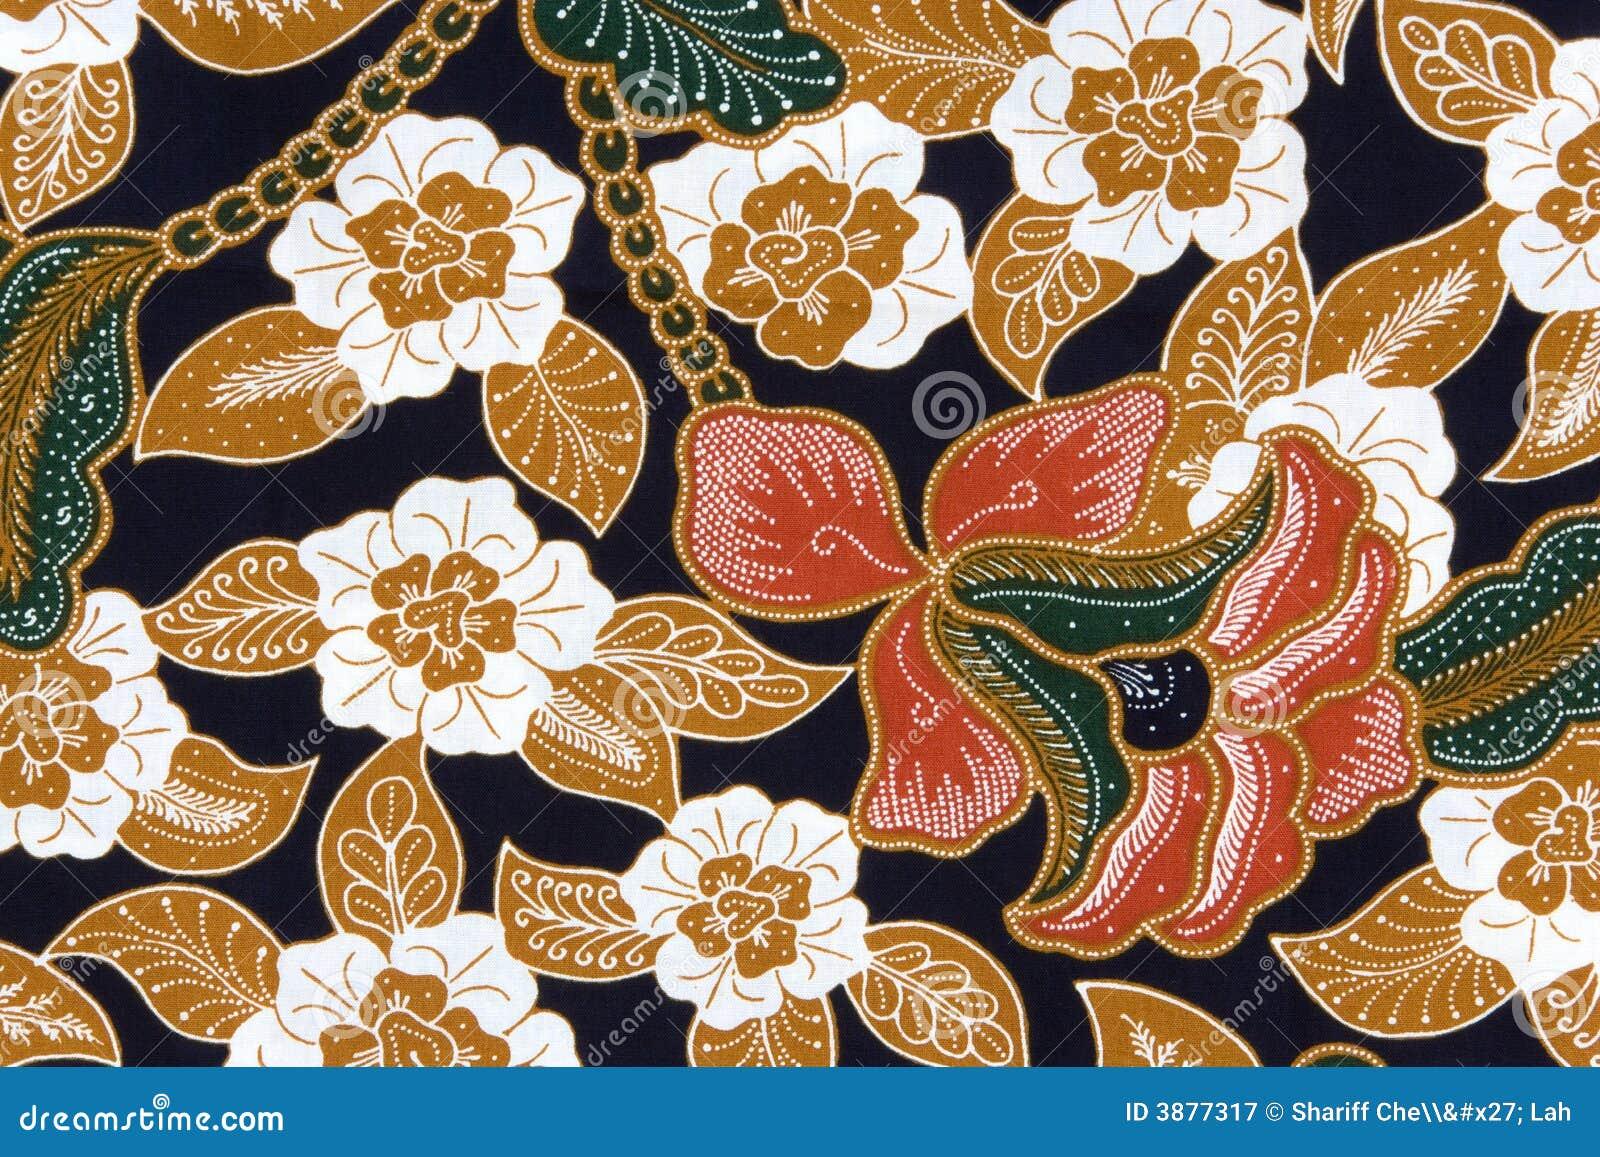 Batik Design Indonesian Batik Saron...